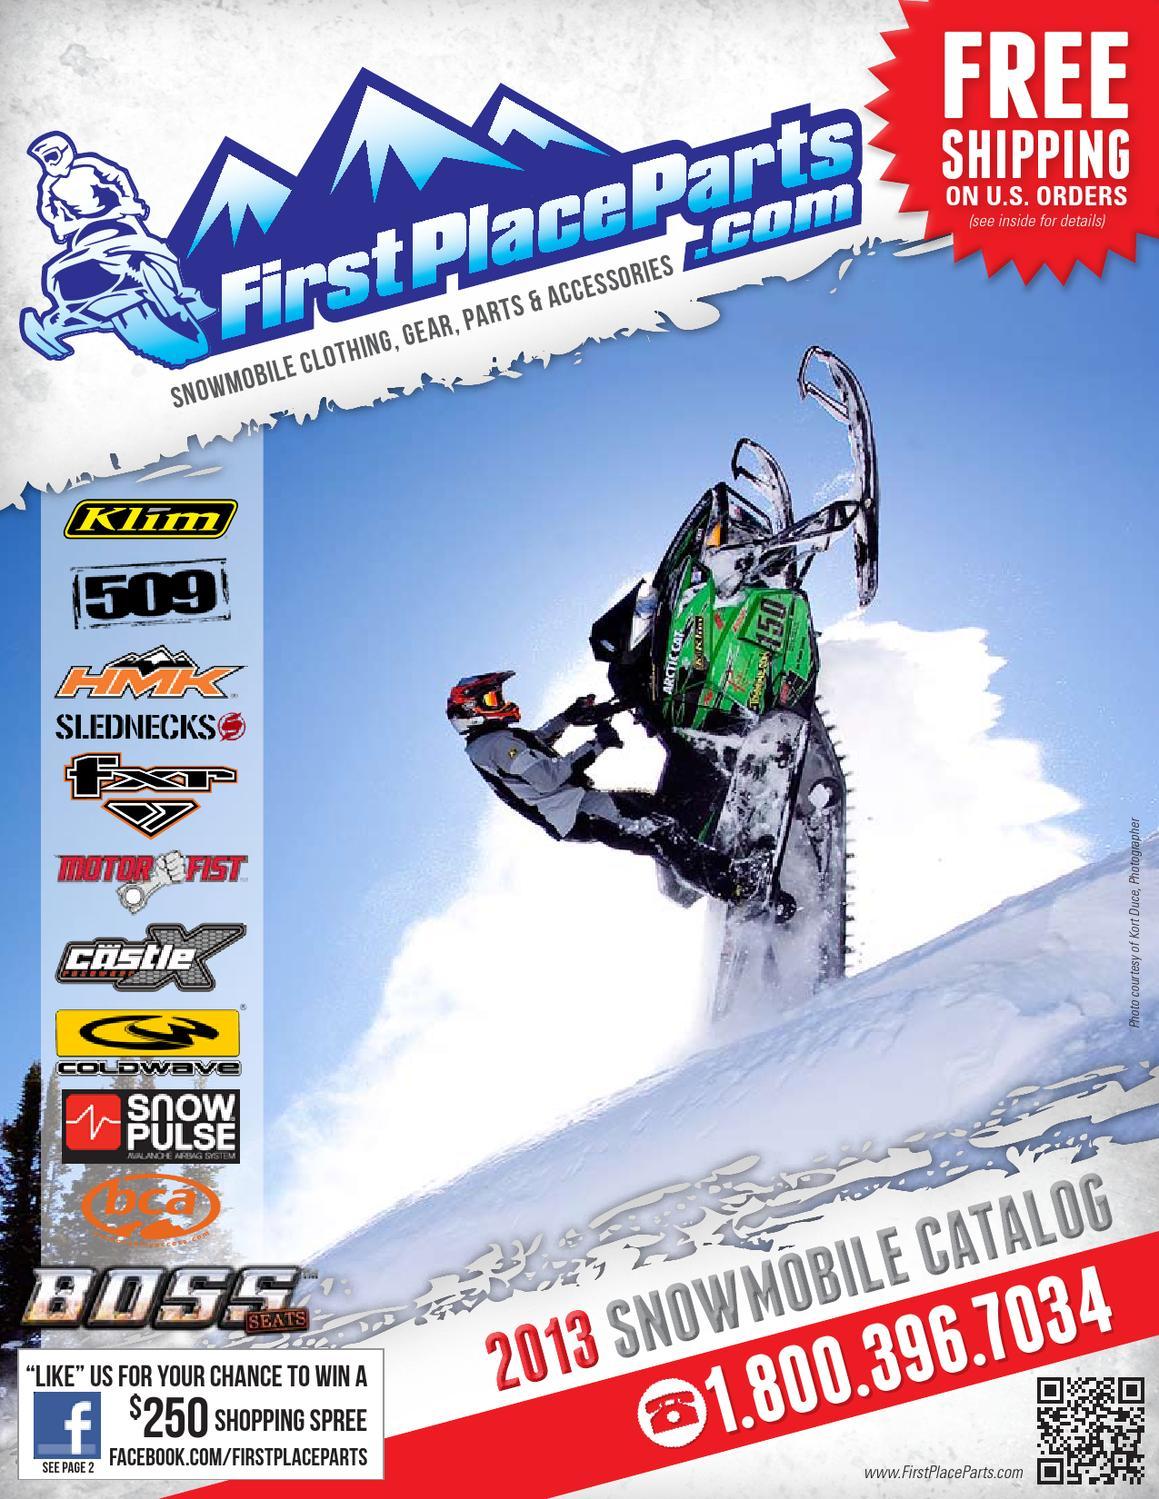 KLIM MAMMOTH SOCK BLACK SNOW MX ENDURO ADVENTURE ALL WEATHER SOCKS ALL SIZES!